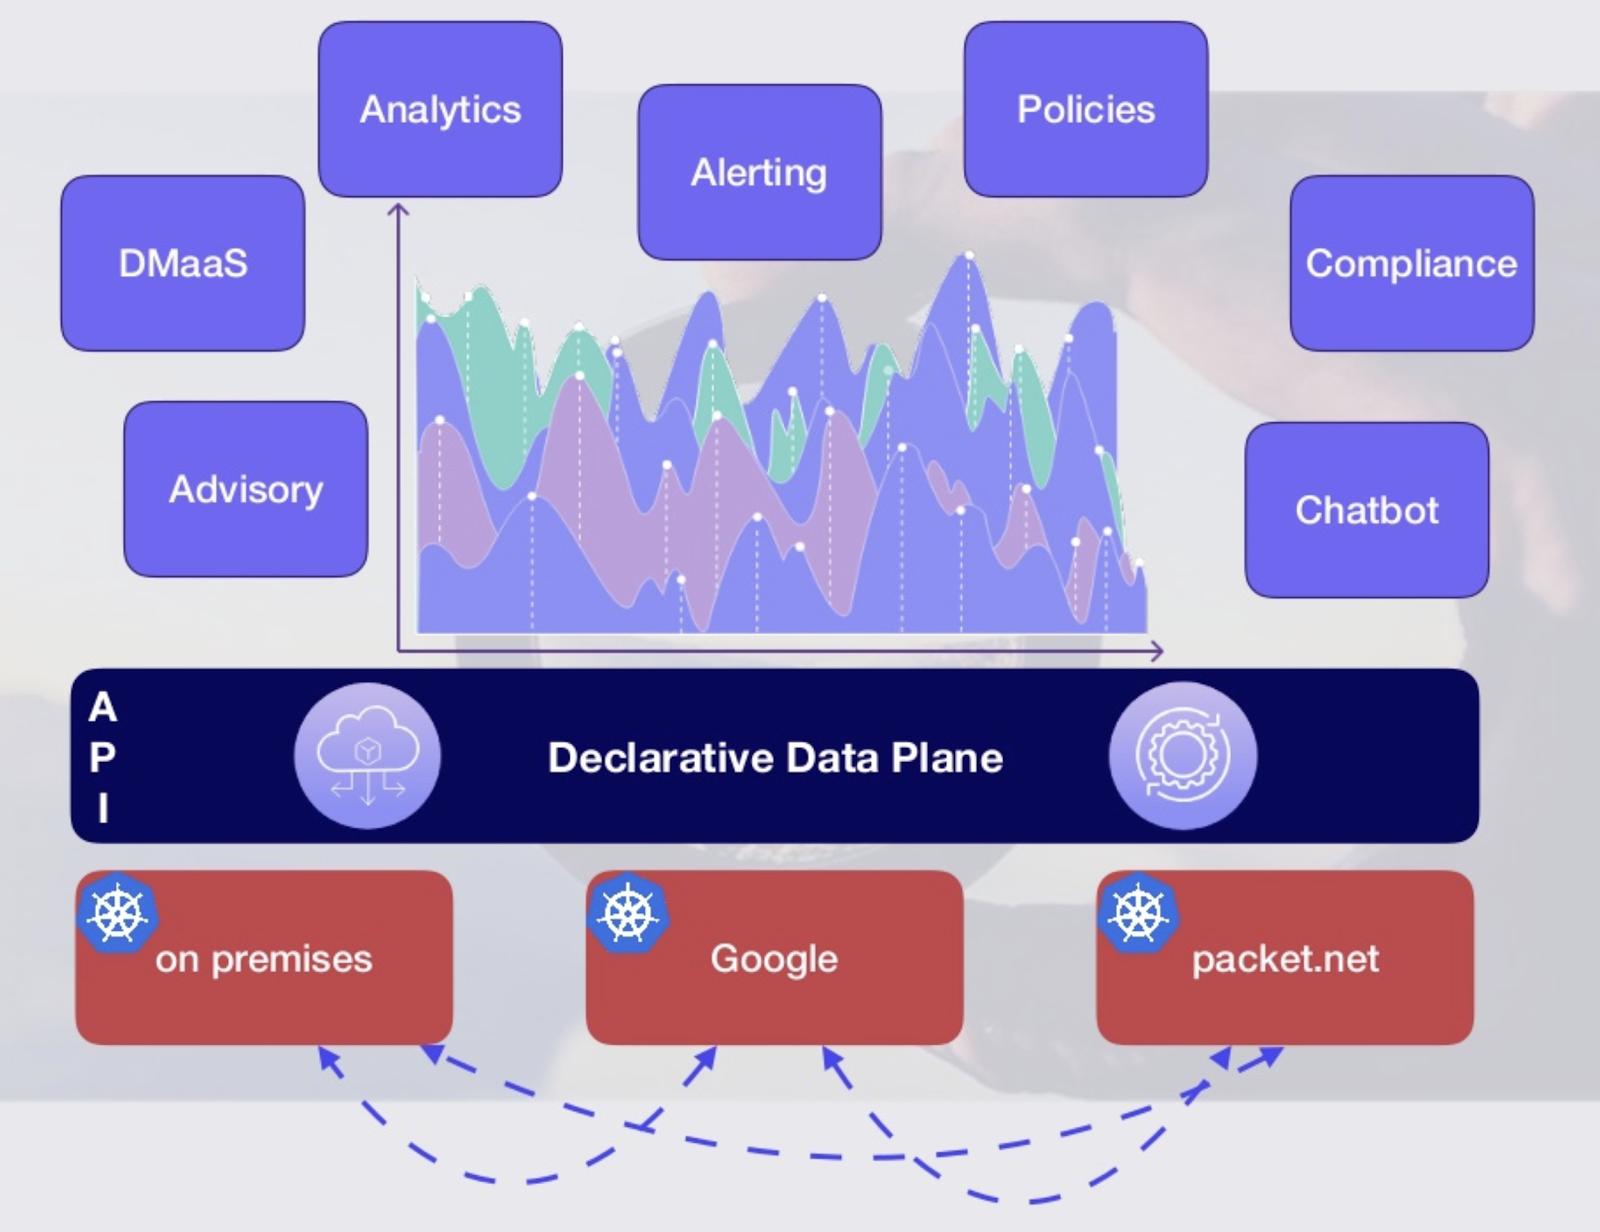 Declarative Data Plane